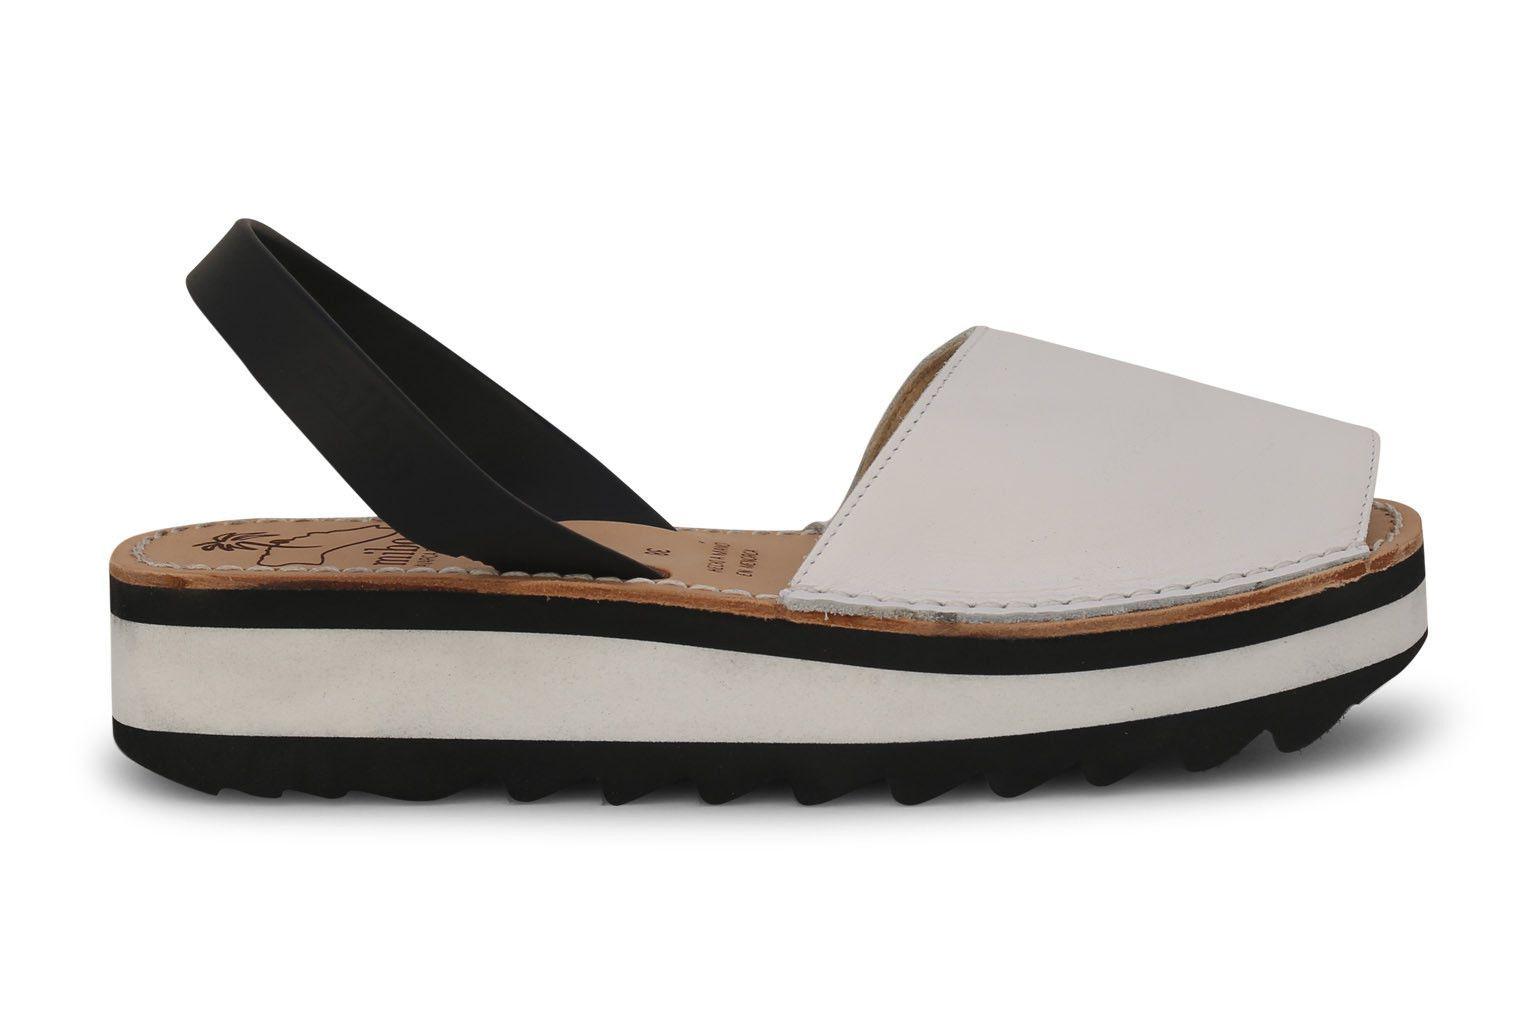 0bf835aa6 Mibo Sport Avarcas White Menorcan Sandals